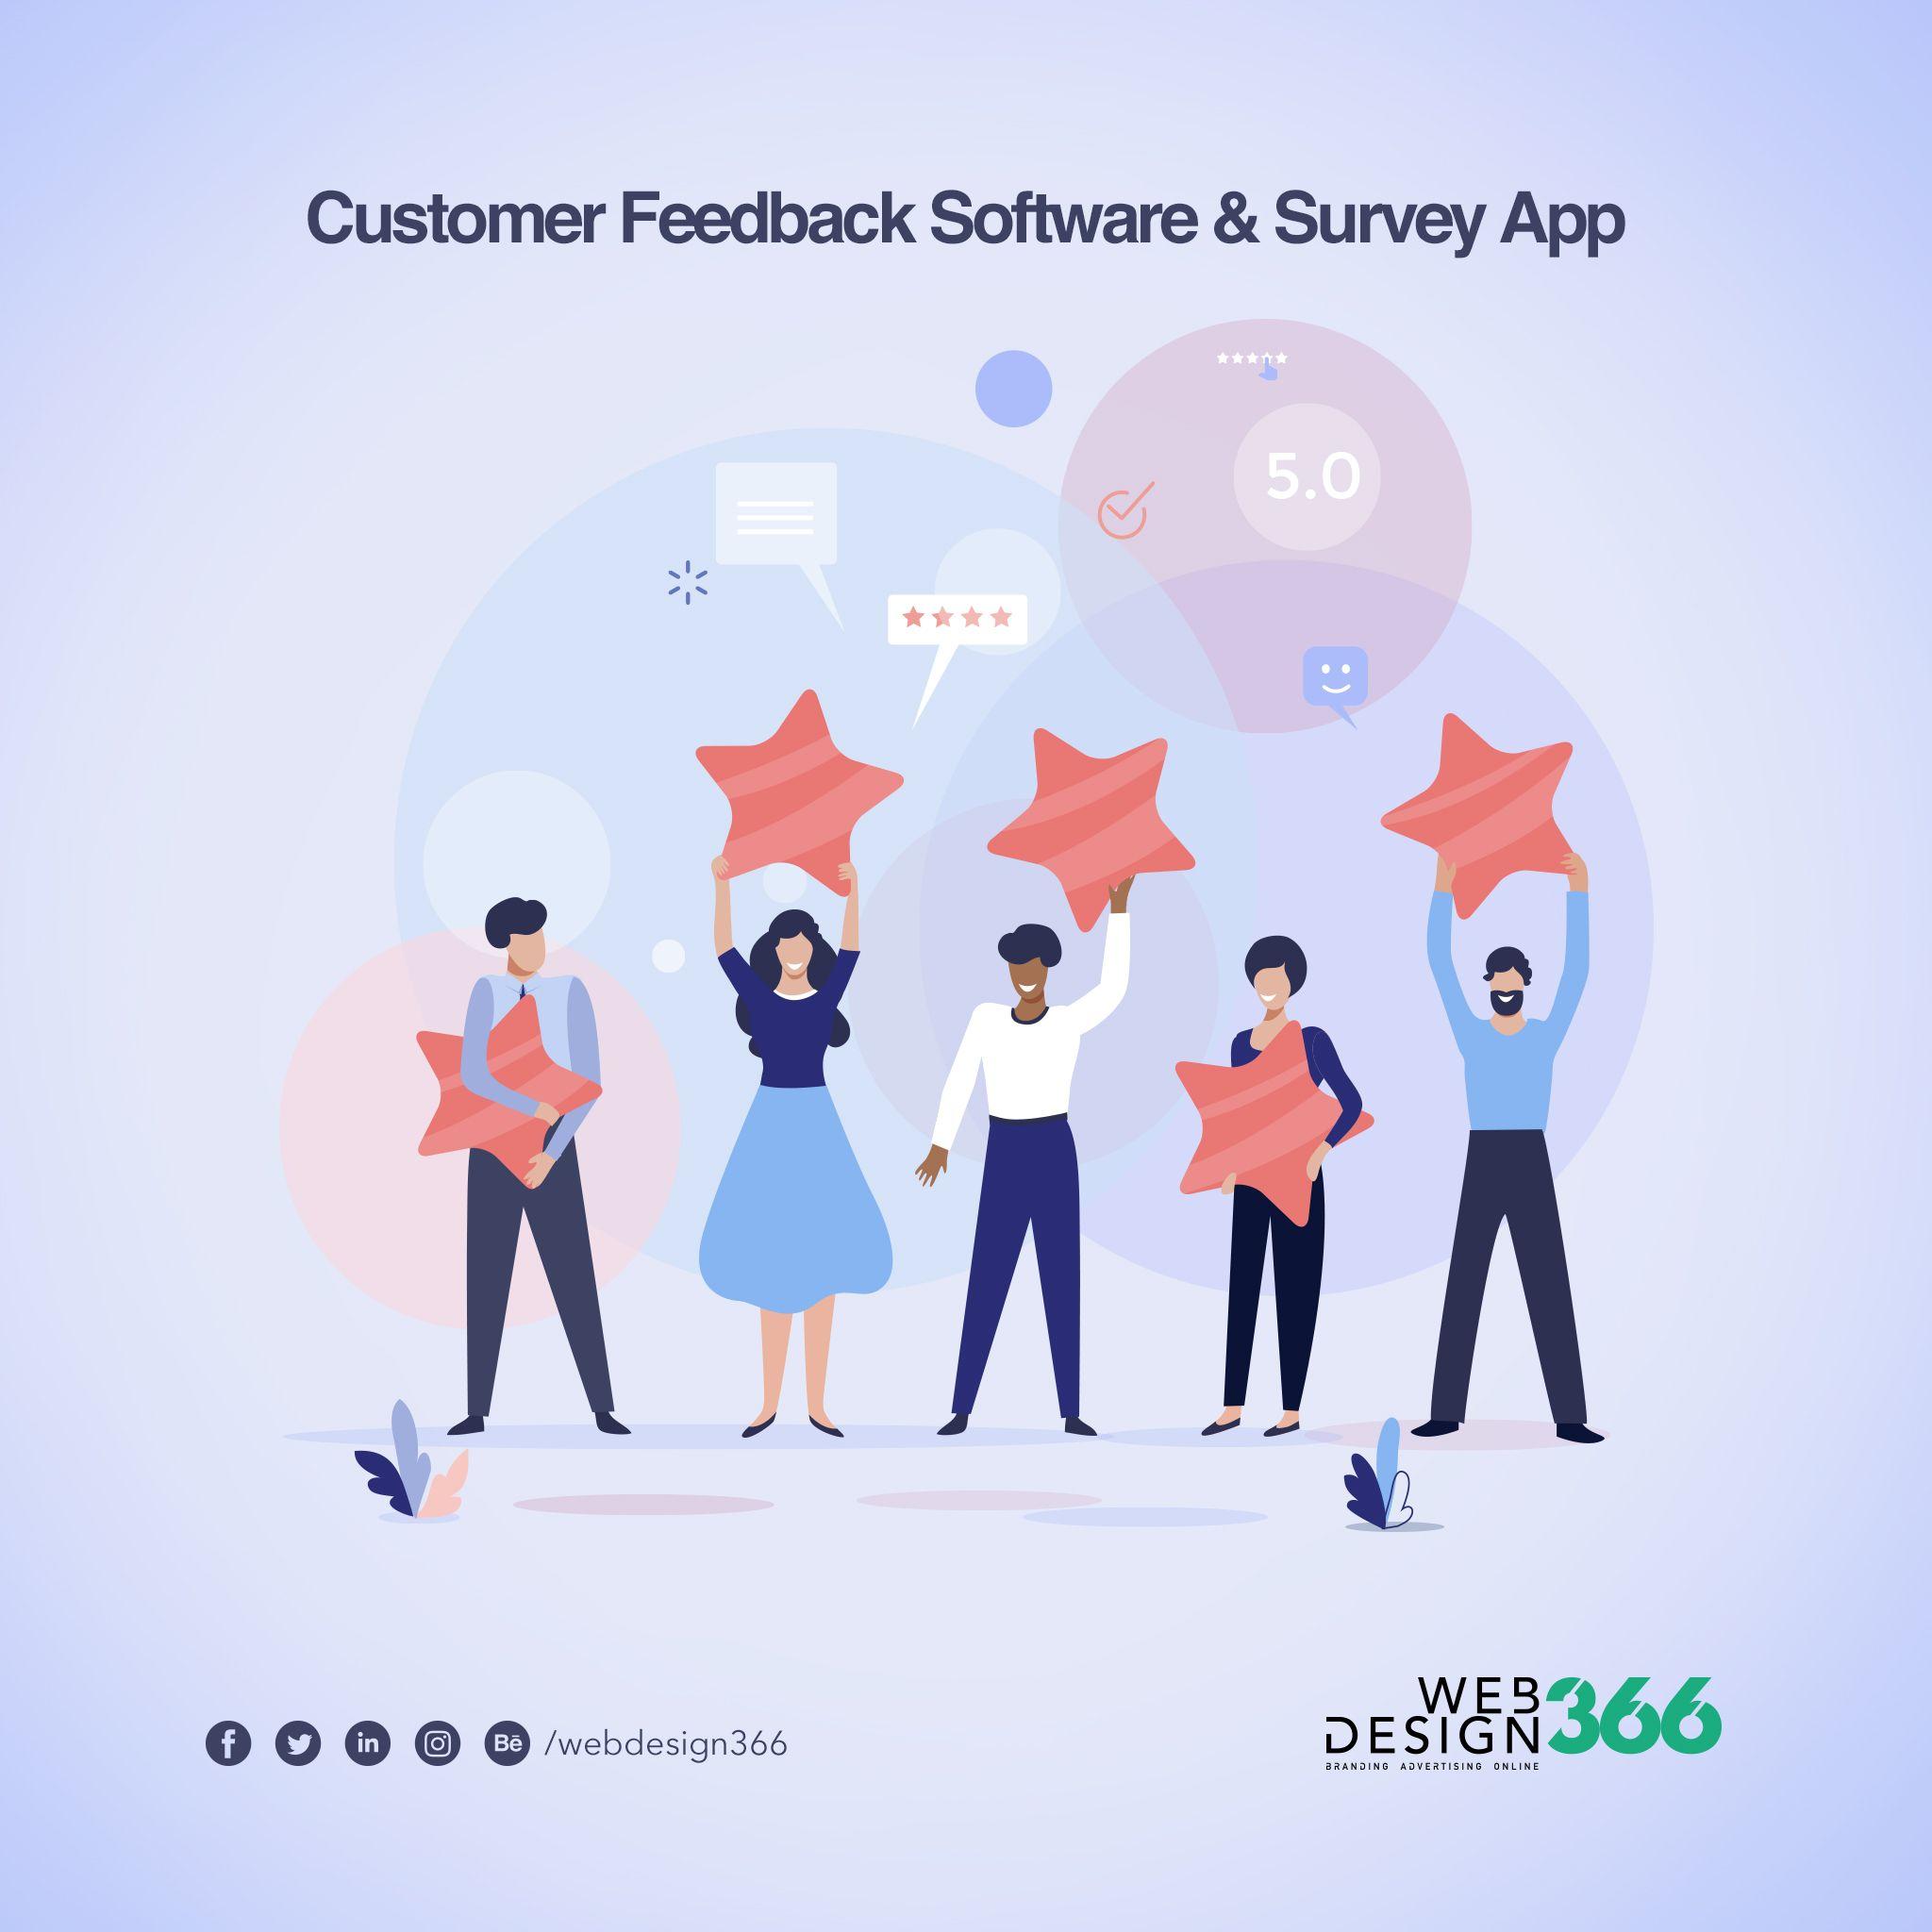 Customer Feedback Software Survey App Survey Design Customer Feedback Online Surveys